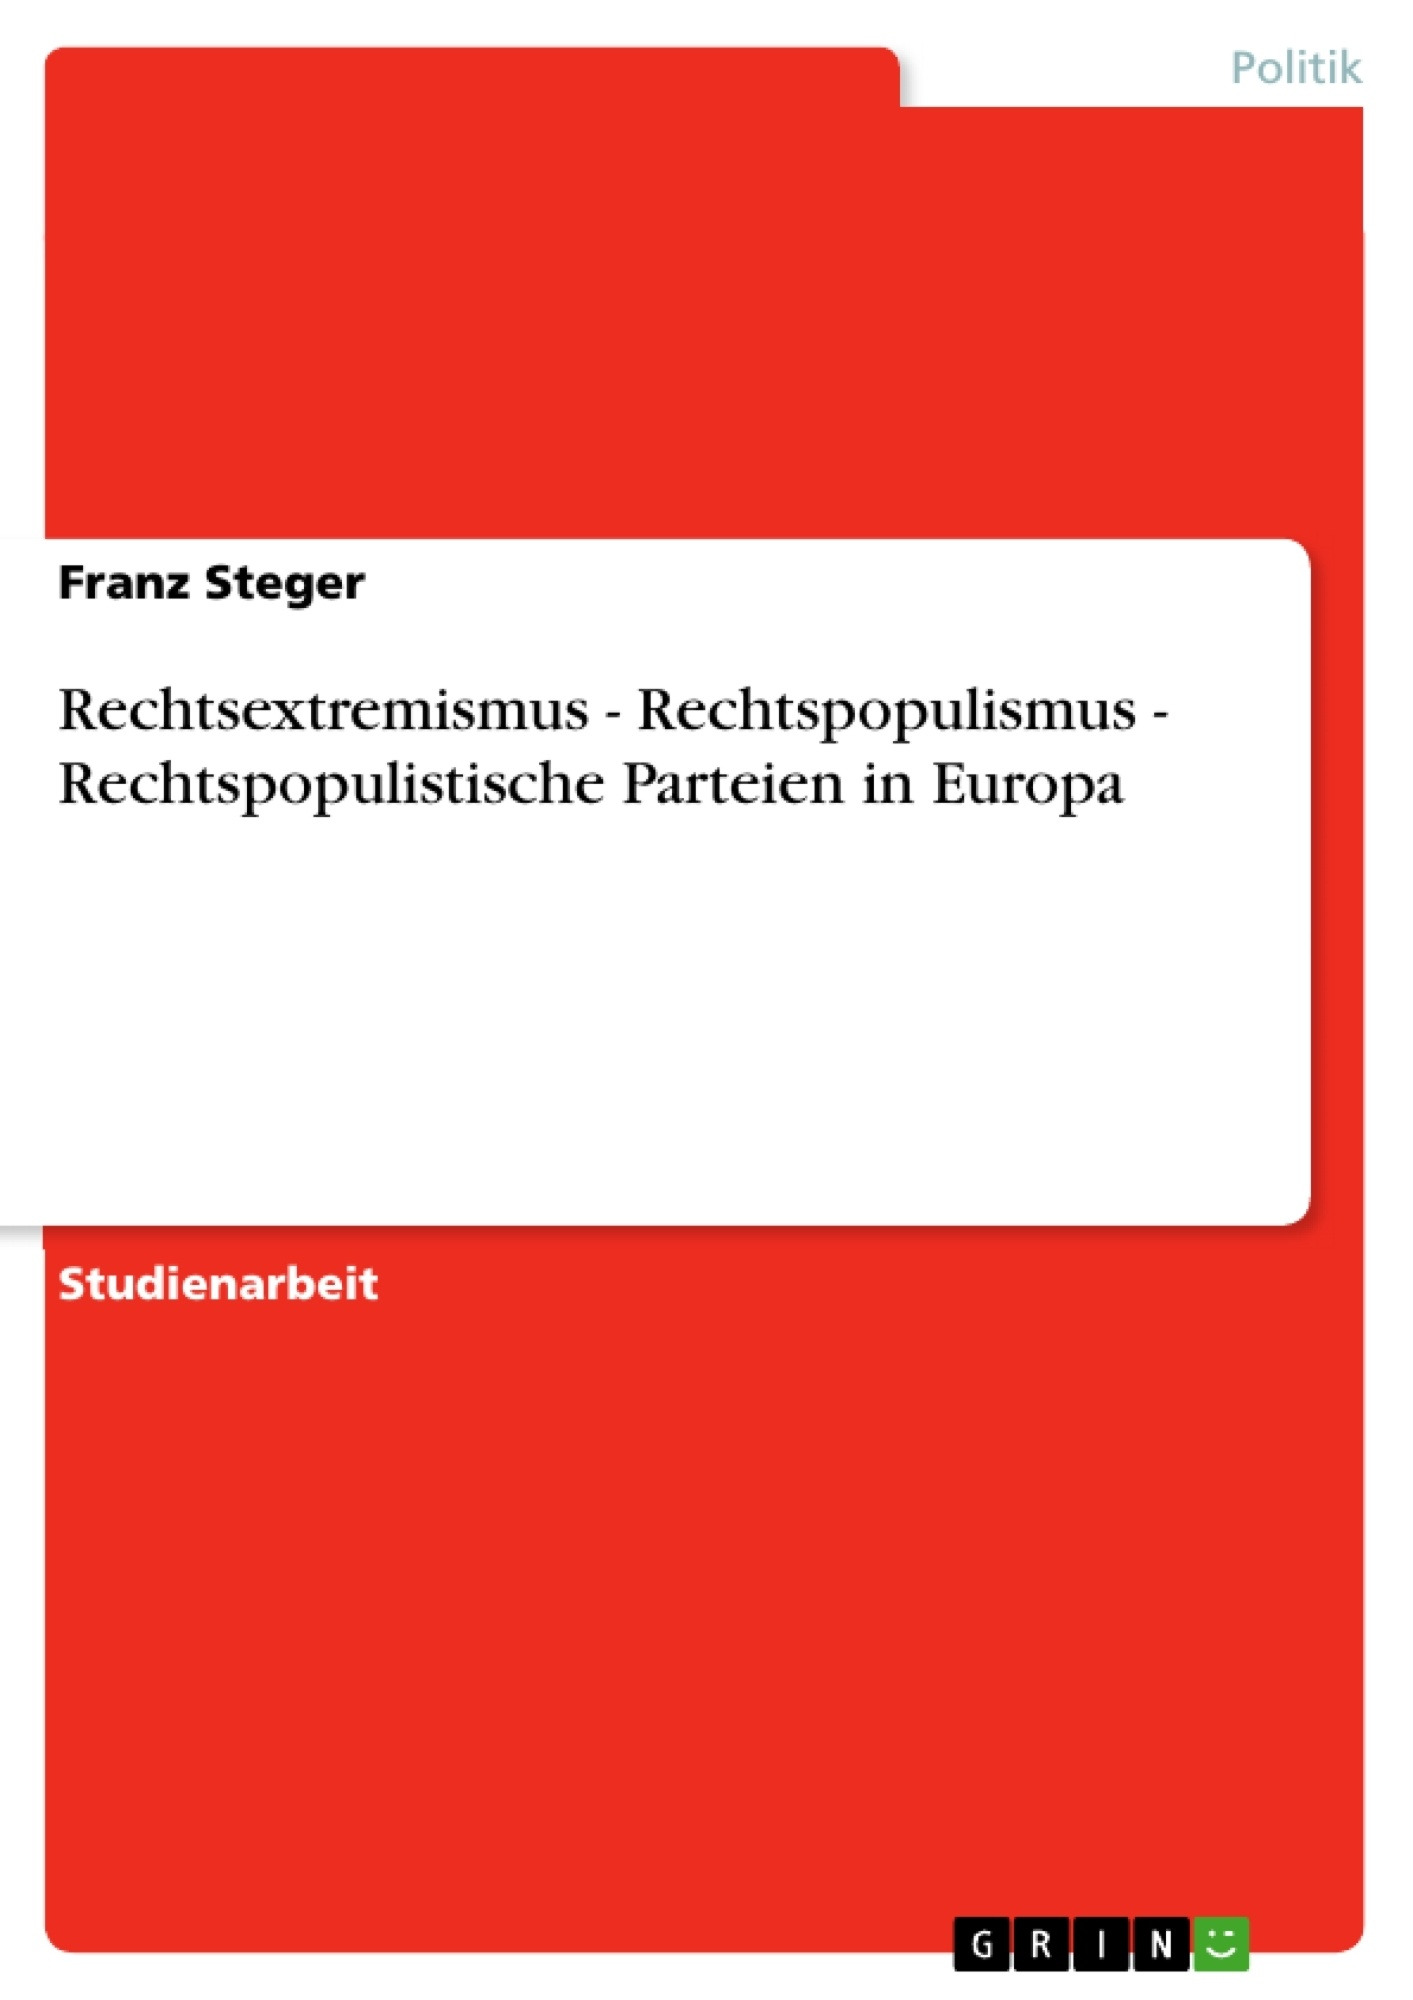 Titel: Rechtsextremismus - Rechtspopulismus - Rechtspopulistische Parteien in Europa